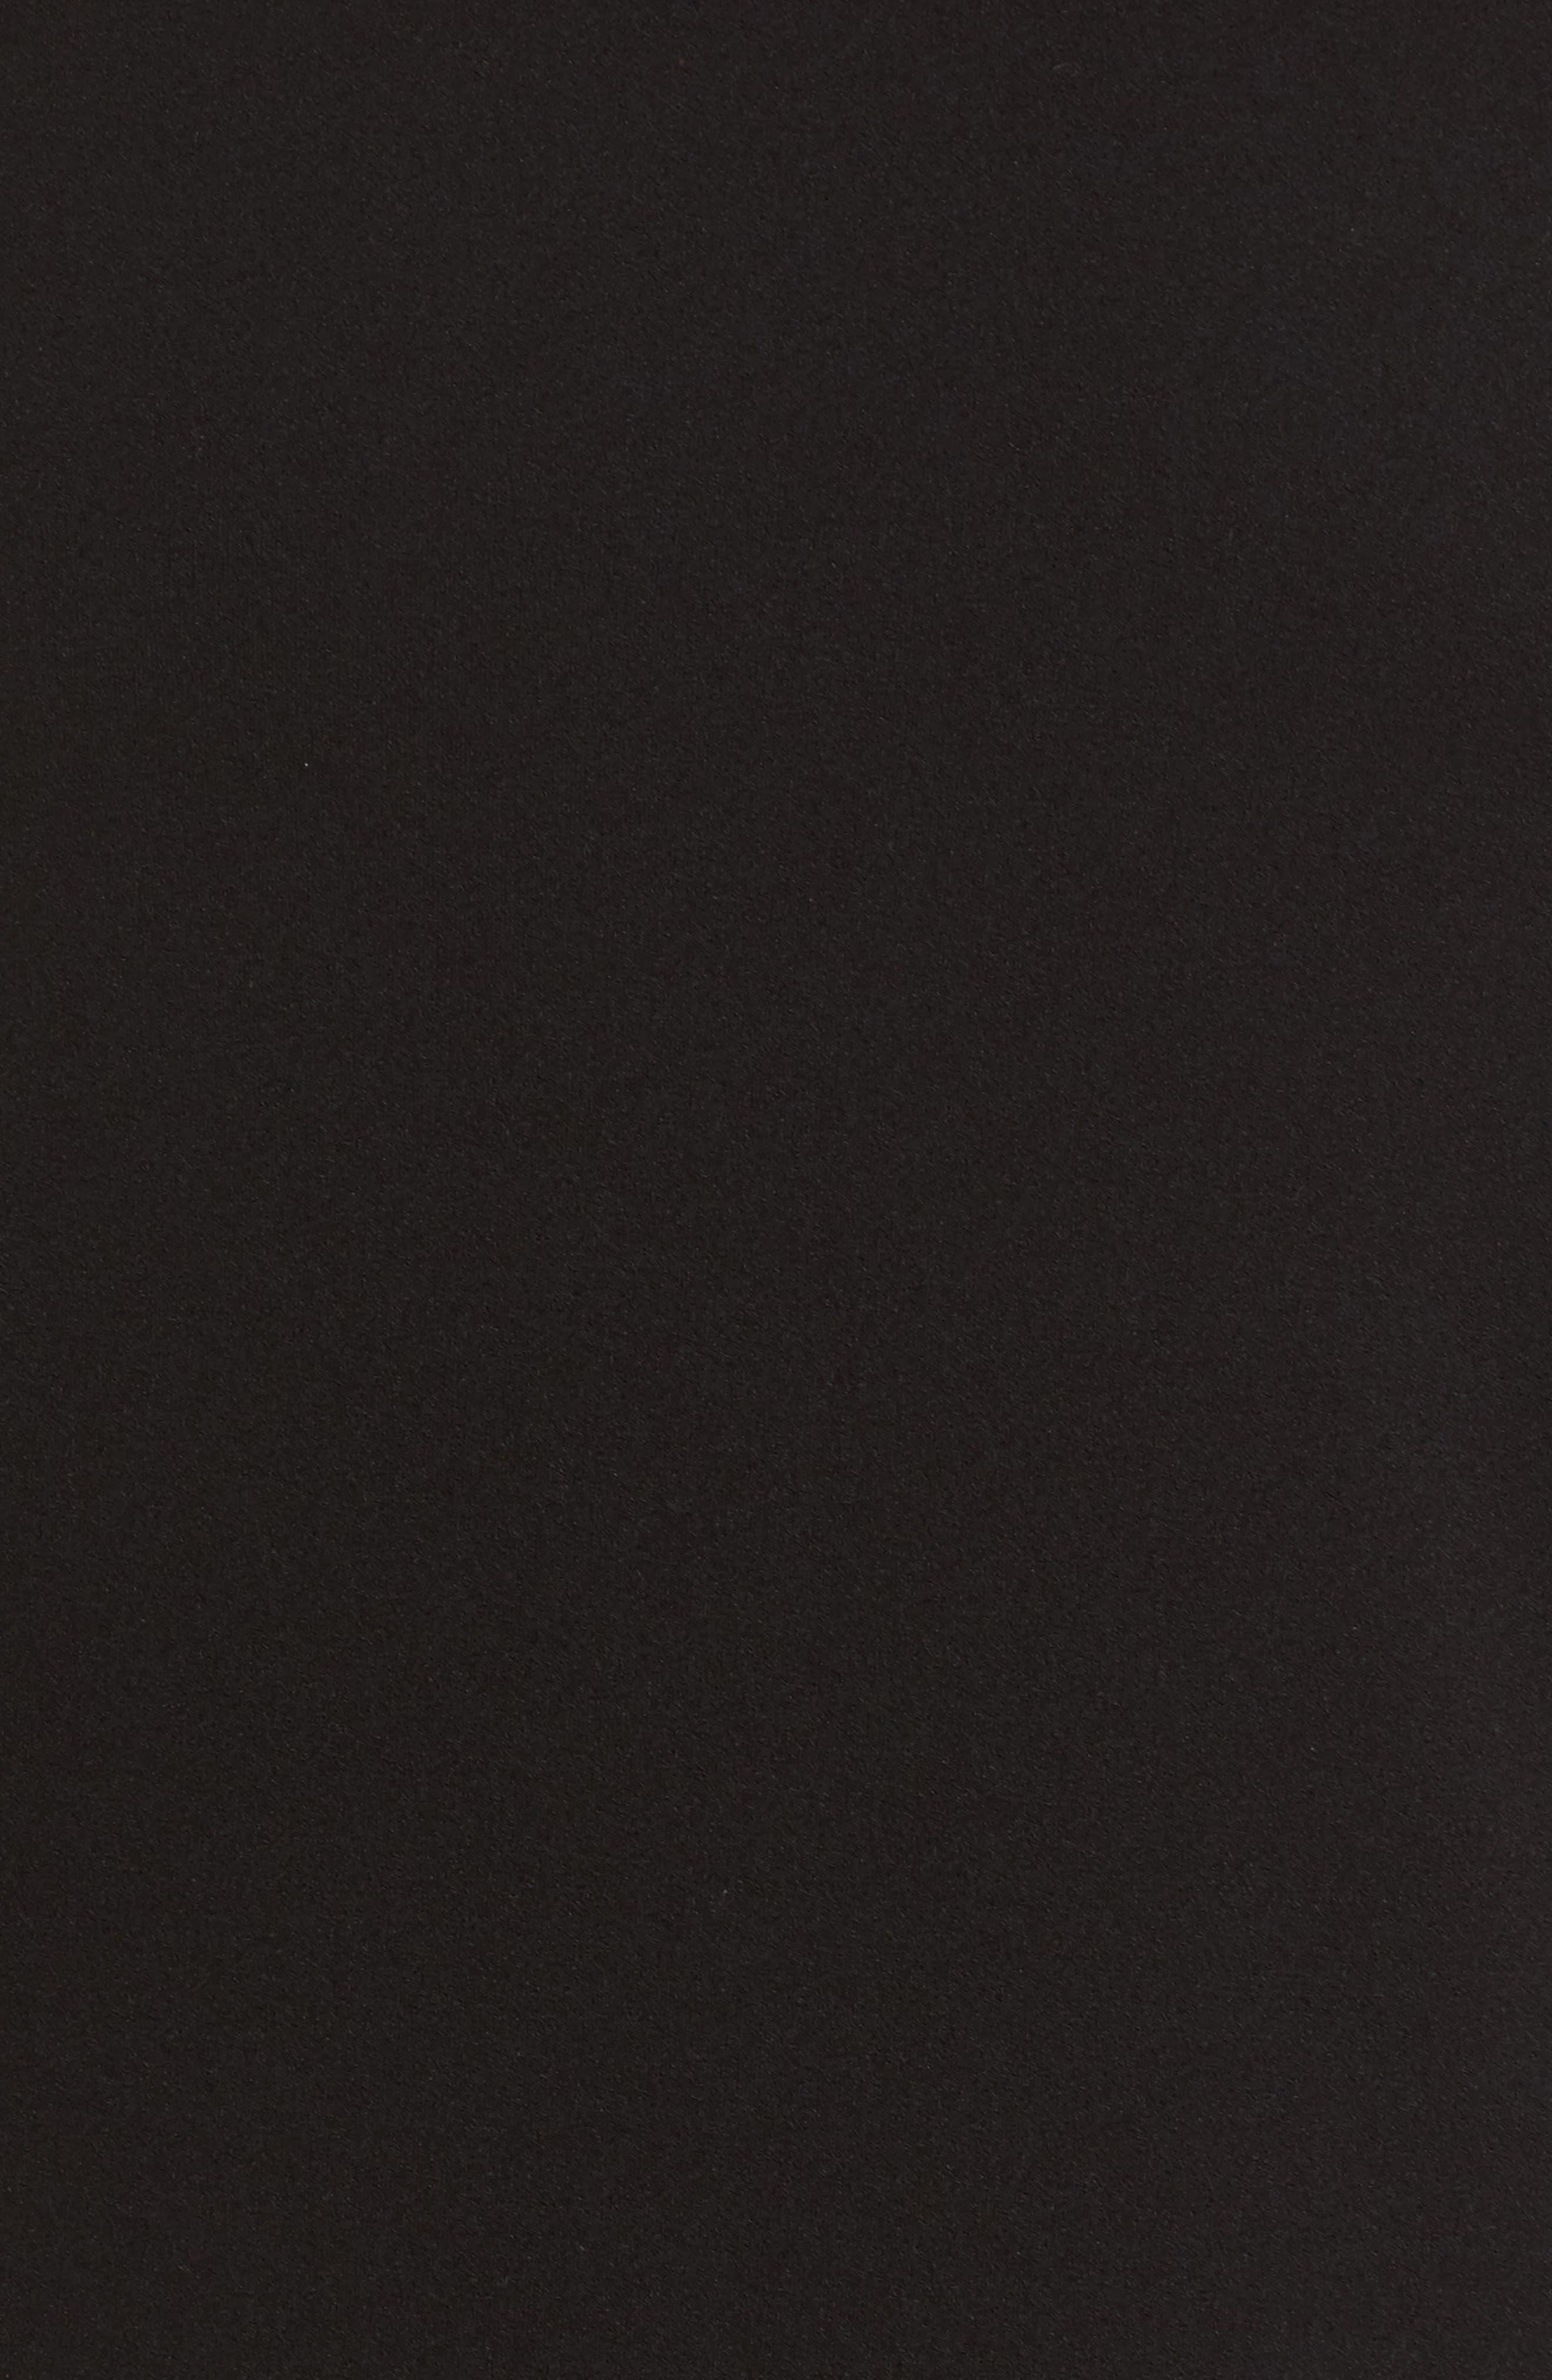 Ruffle Sleeve Sheath Dress,                             Alternate thumbnail 5, color,                             001